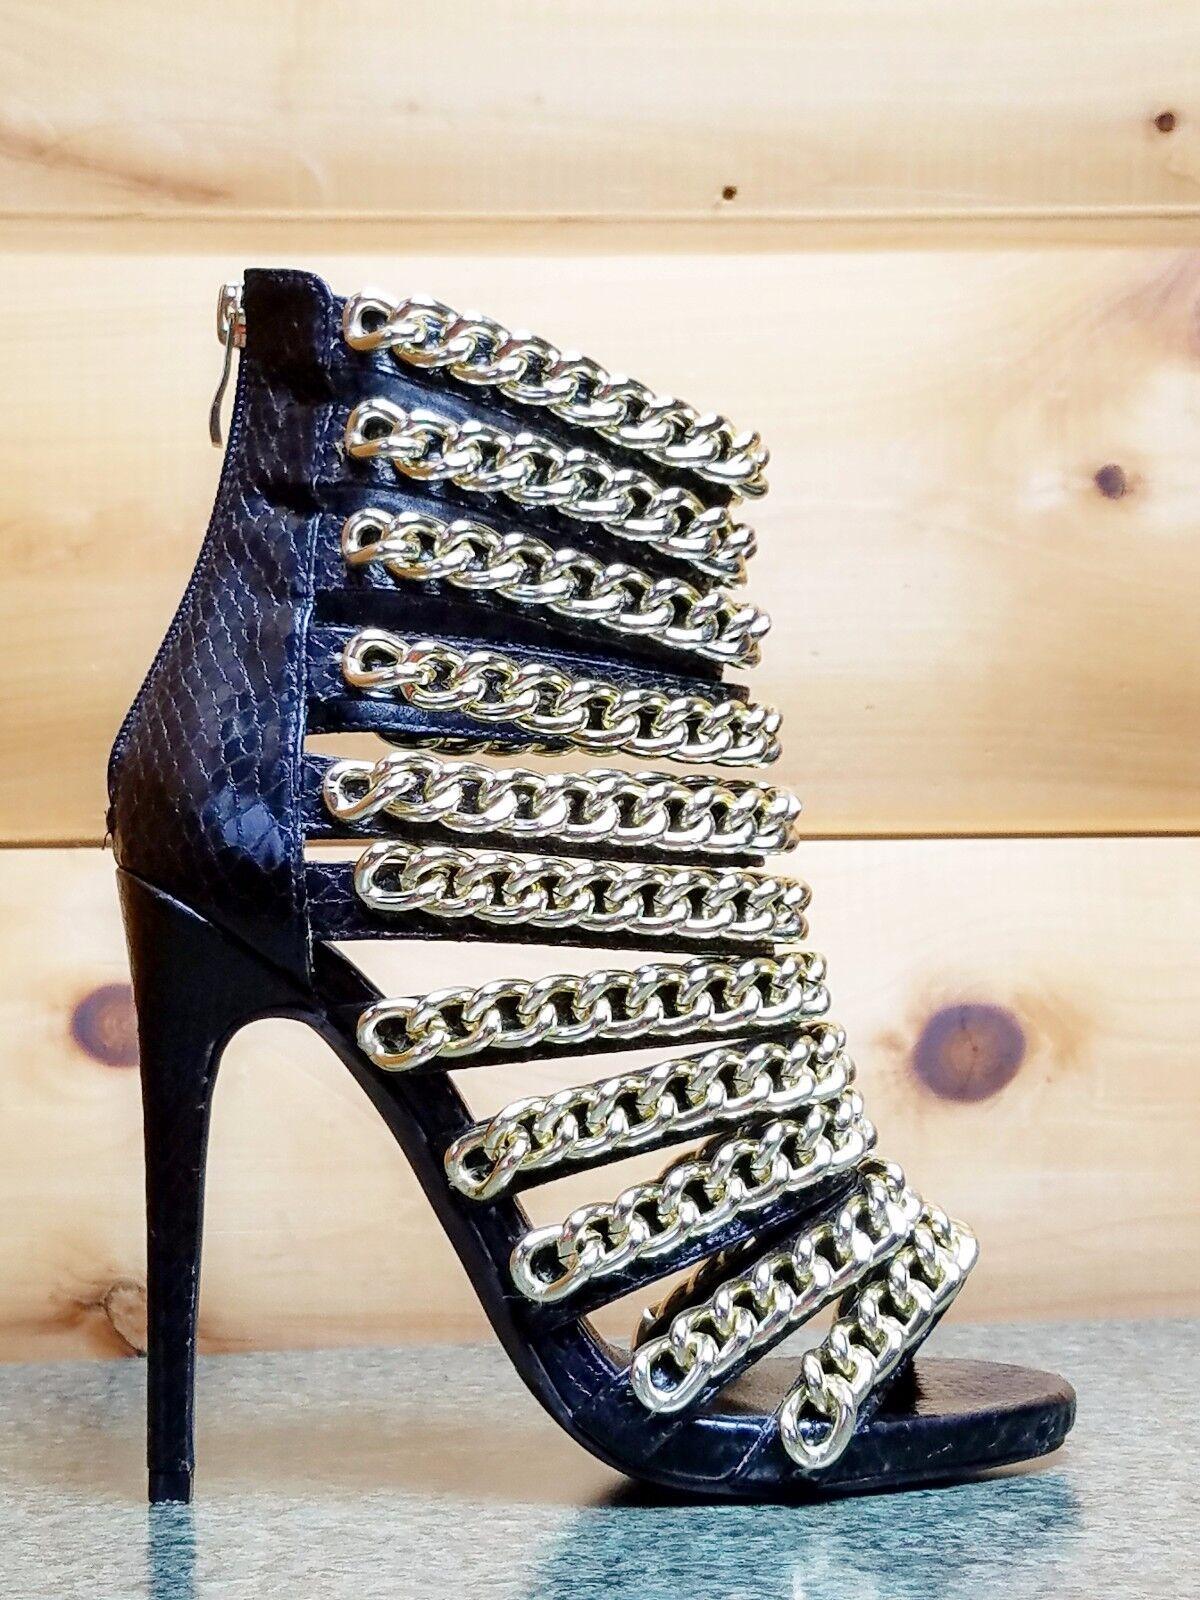 Nelly Bernal Bernal Bernal Black Snake Multi Chain Strap 4.5  High Heel Mini Platform shoes 9f10c0